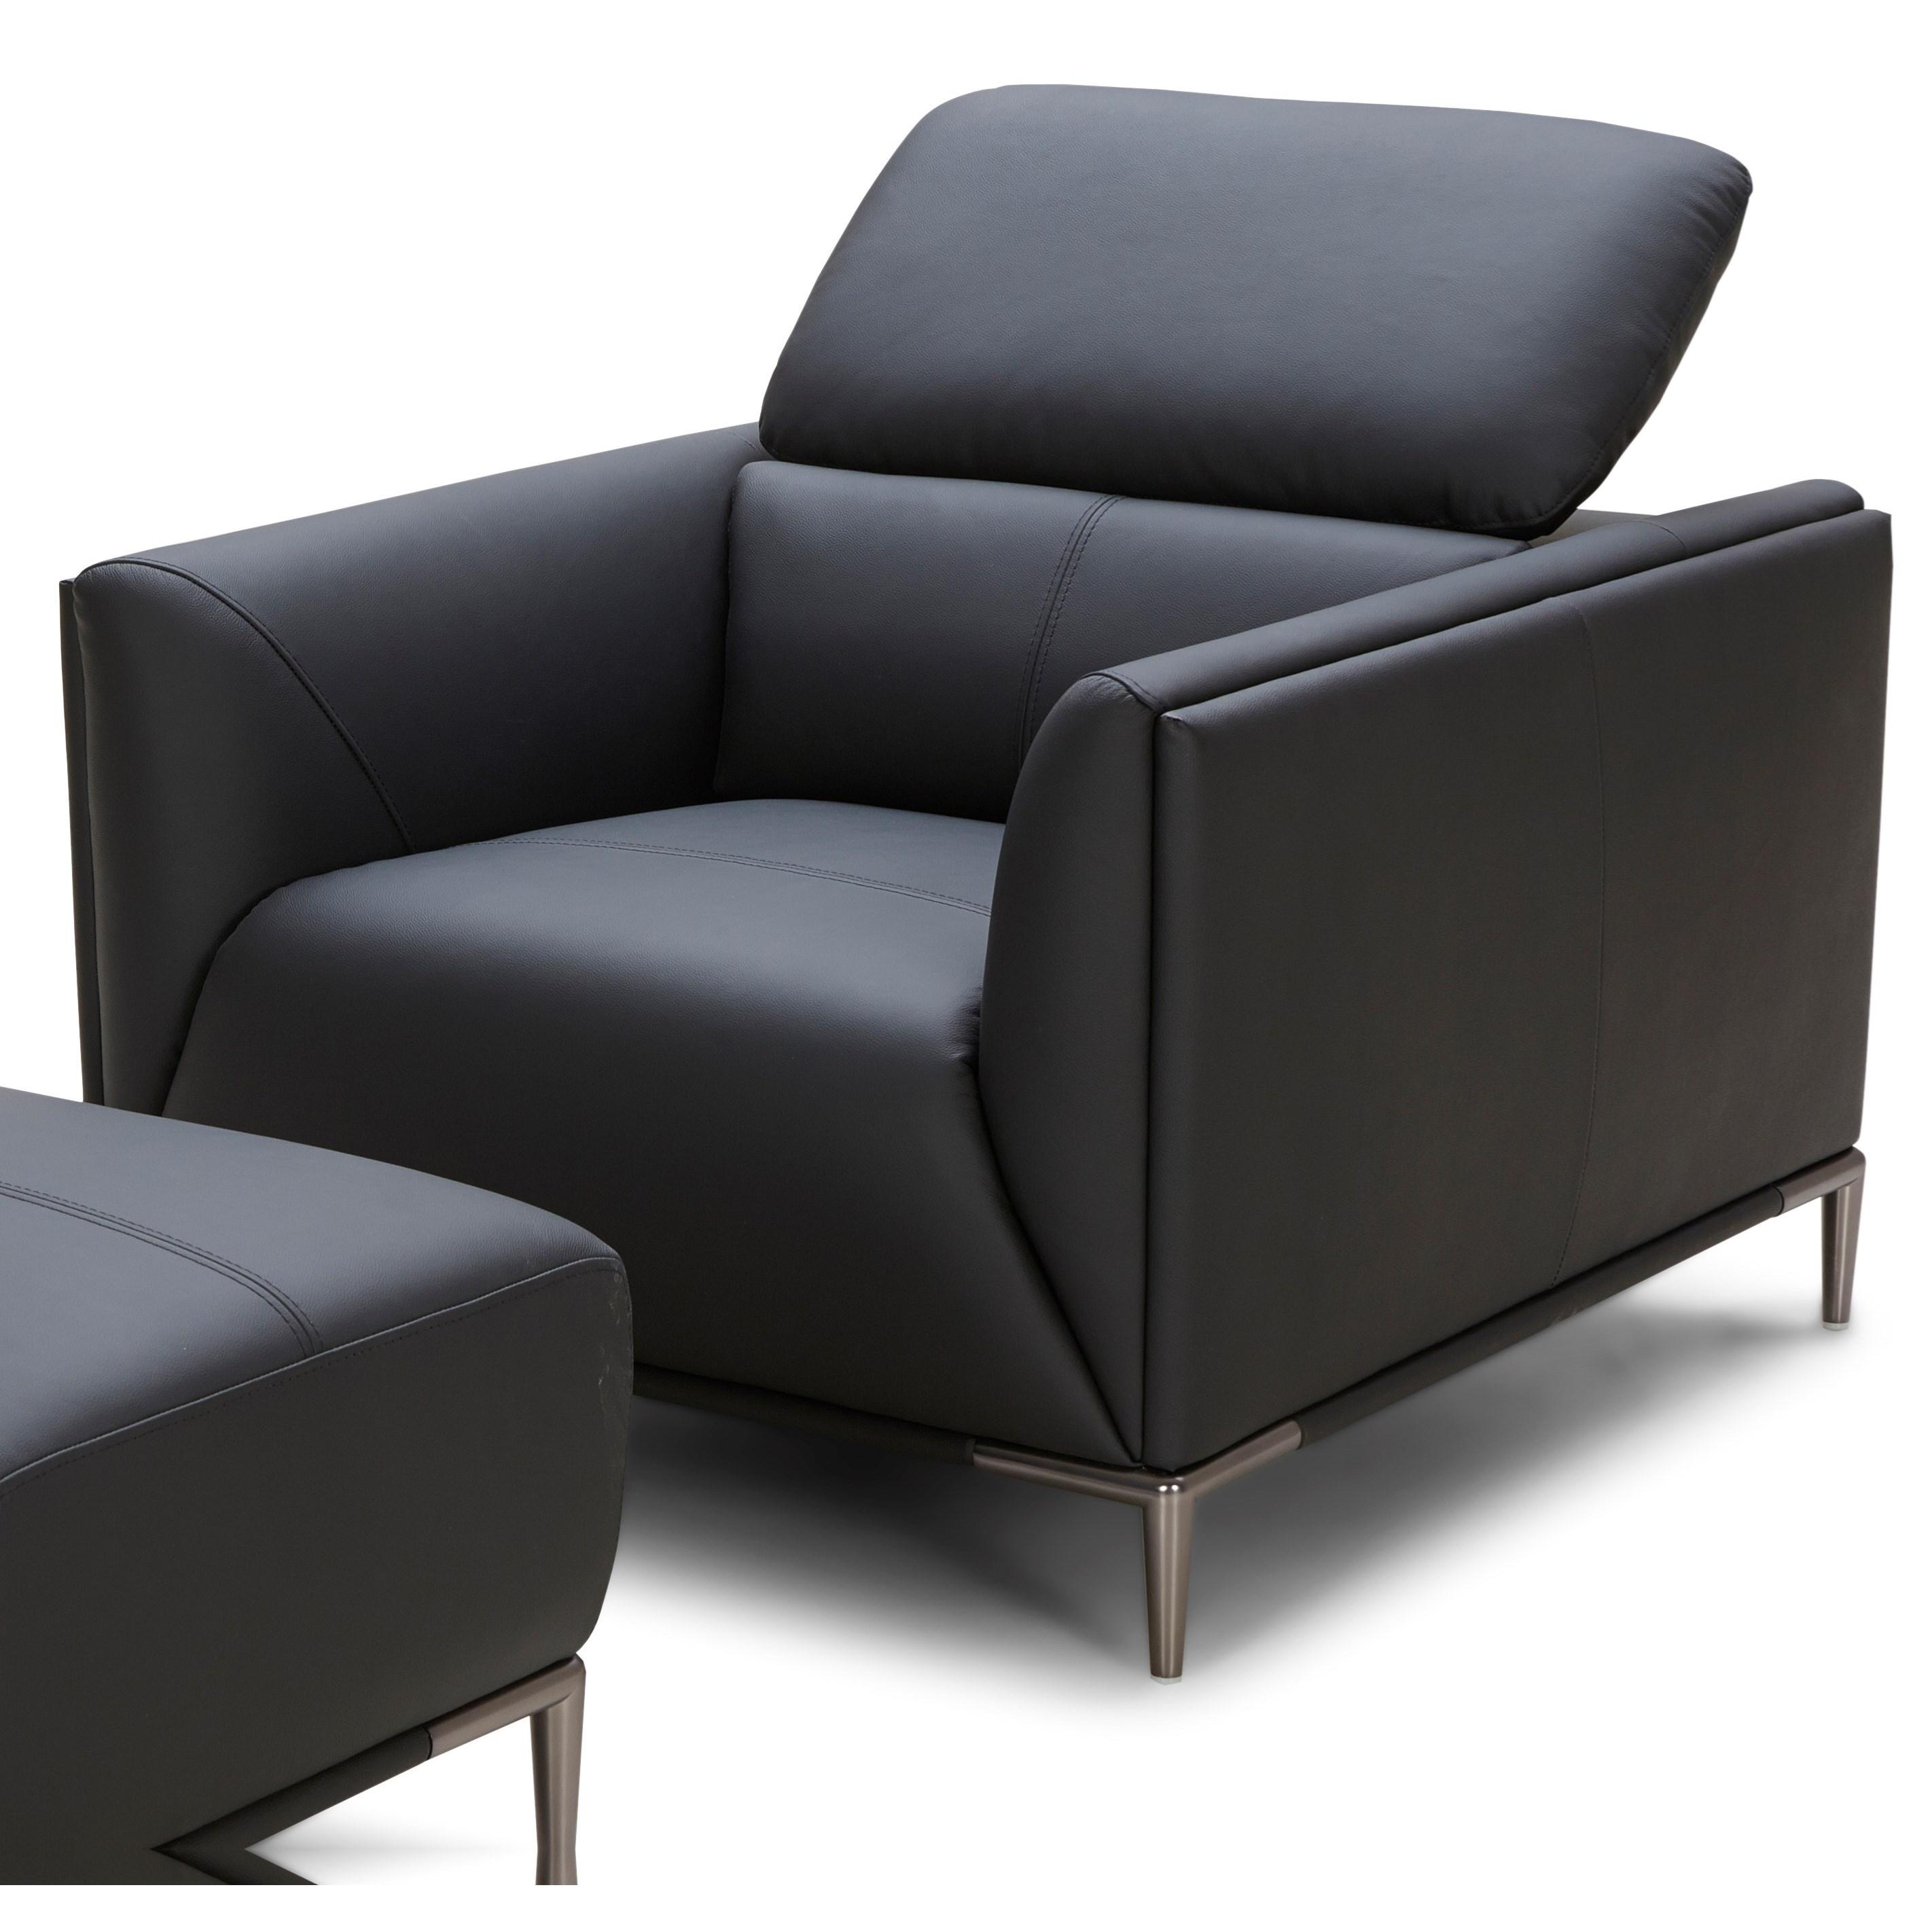 Urban Evolution 5167 Chair - Item Number: 5167-1